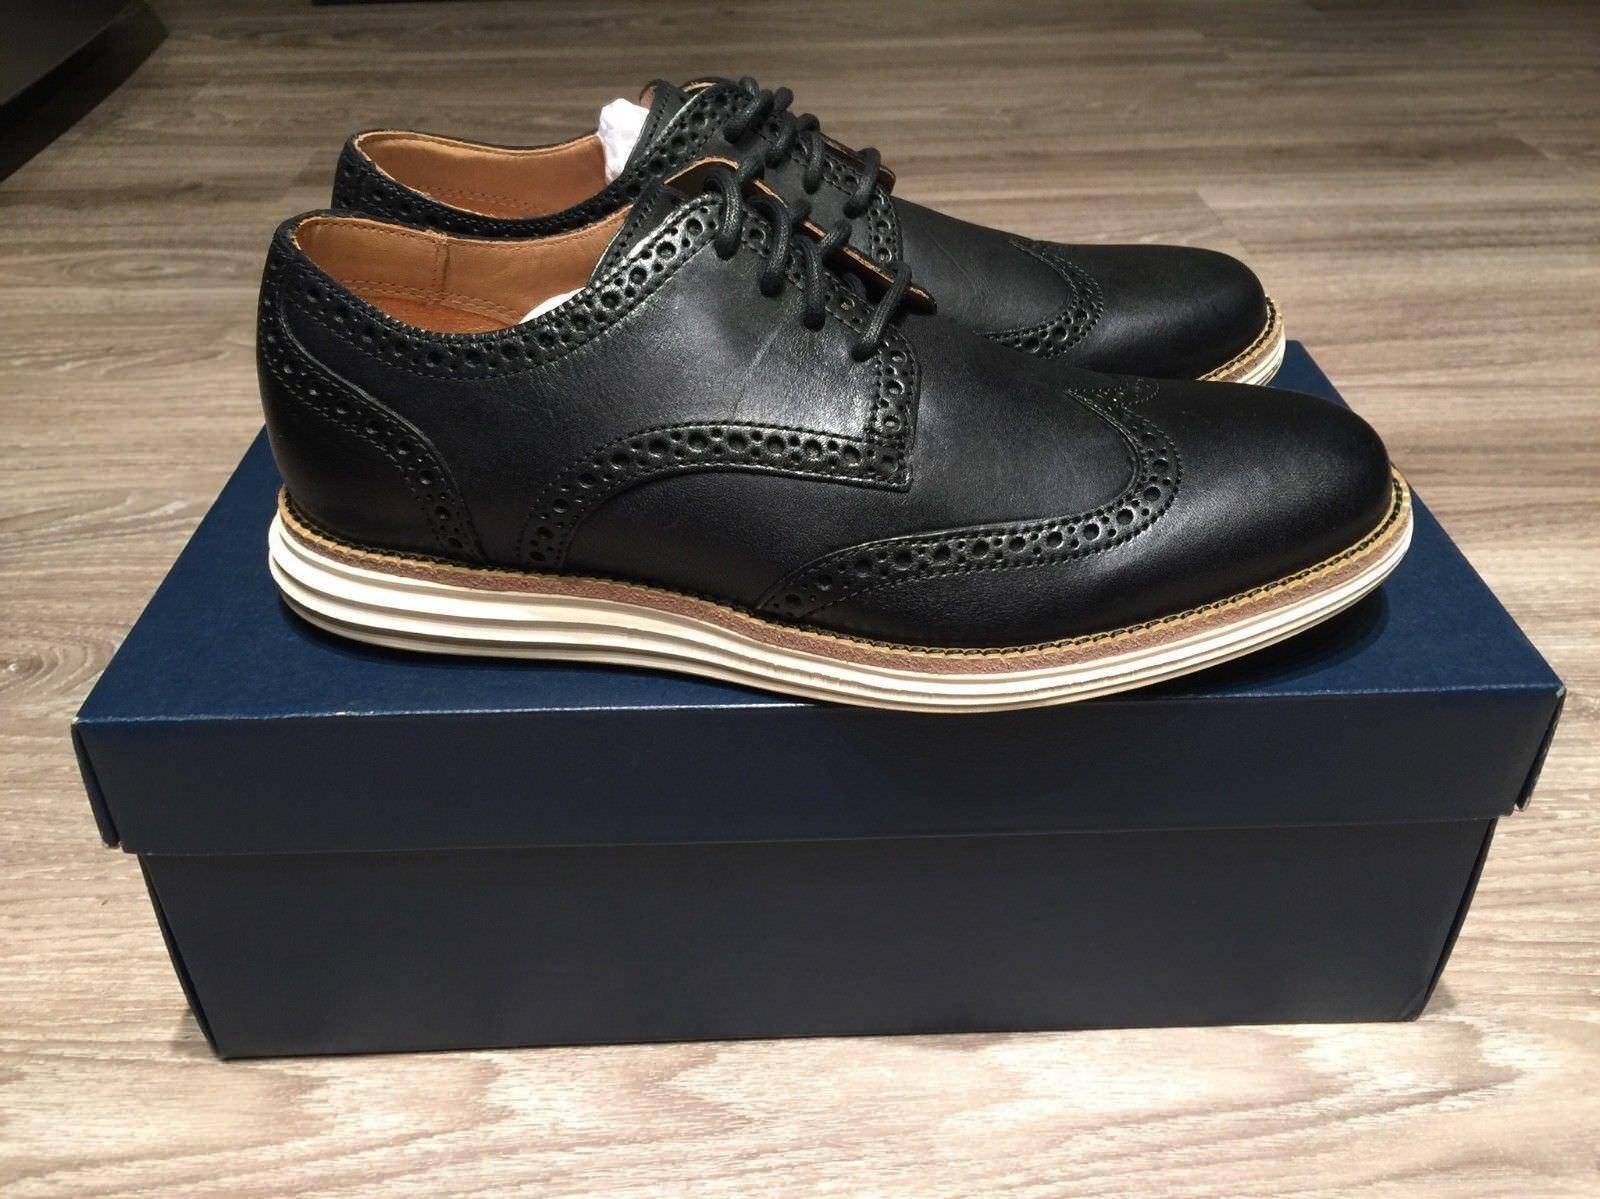 2179b80ccc9d Cole Cole Cole Haan LunarGrand Wing Tip Leather Black Ivory Men s 7 C14110  BRAND NEW 7e6e1d